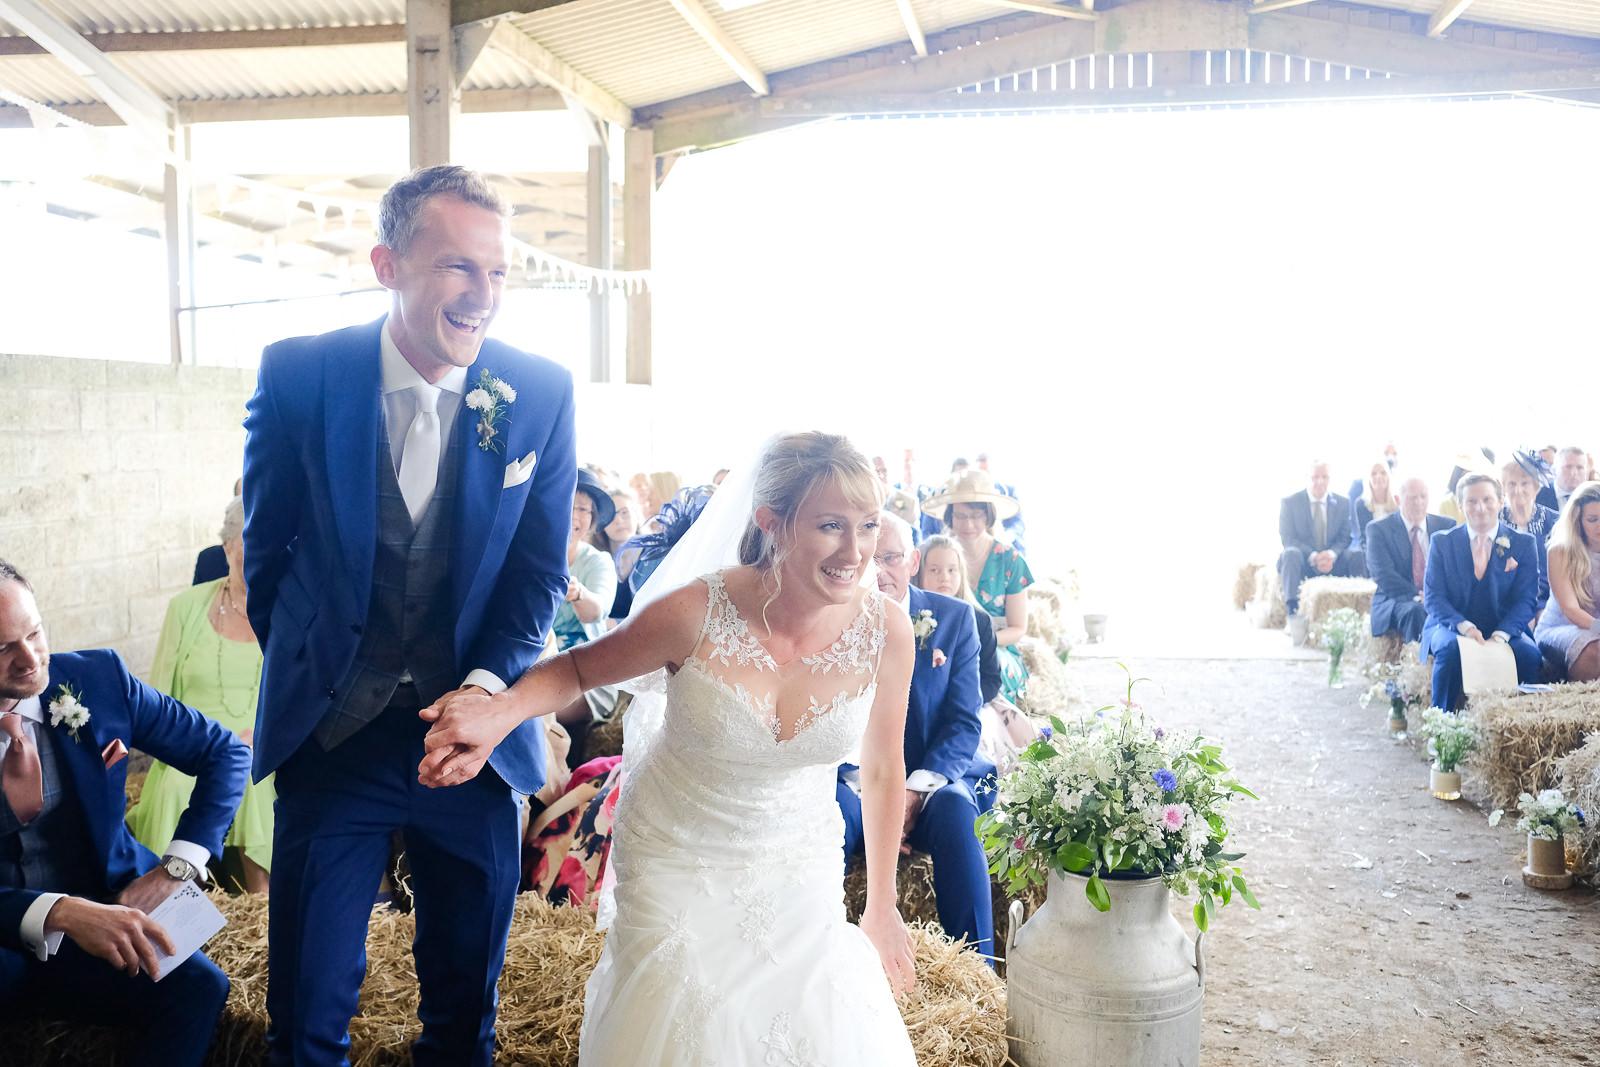 Roscarrock Farm wedding in Cornwall 031.jpg